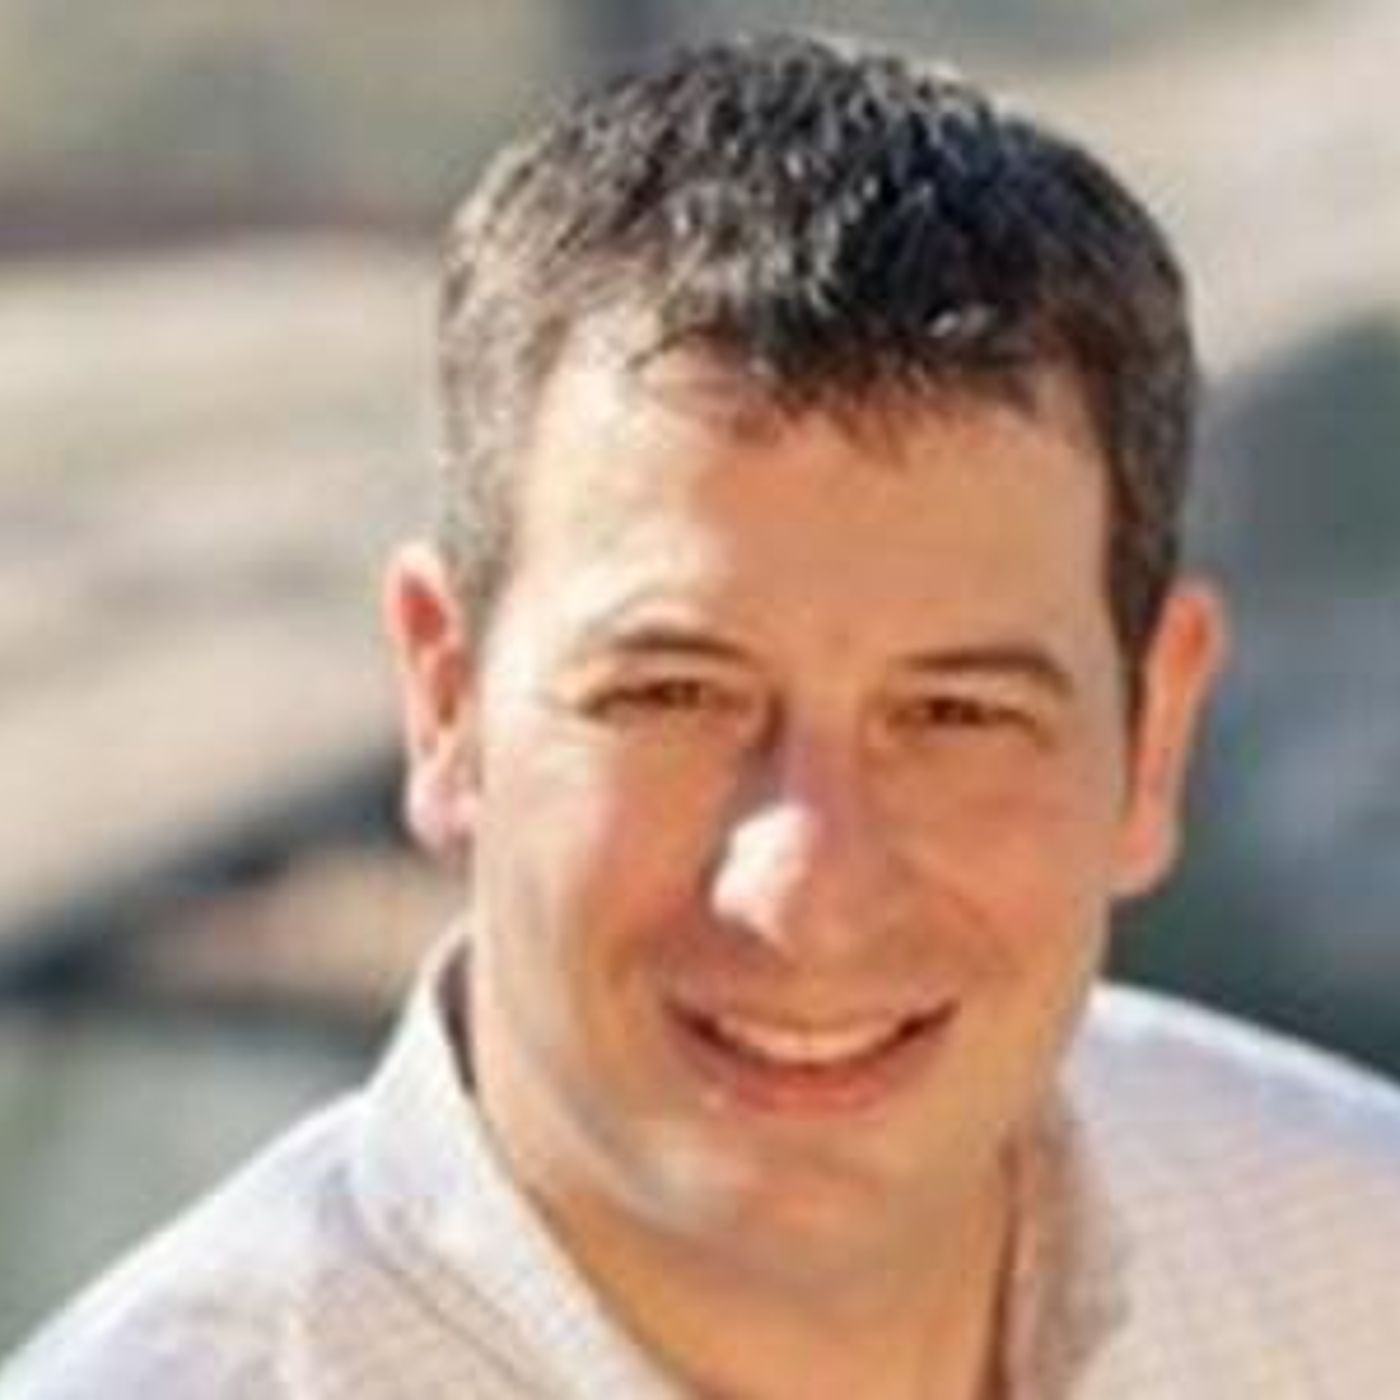 Paid vs. Unpaid Internships with Dr. Robert Shindell PhD #58